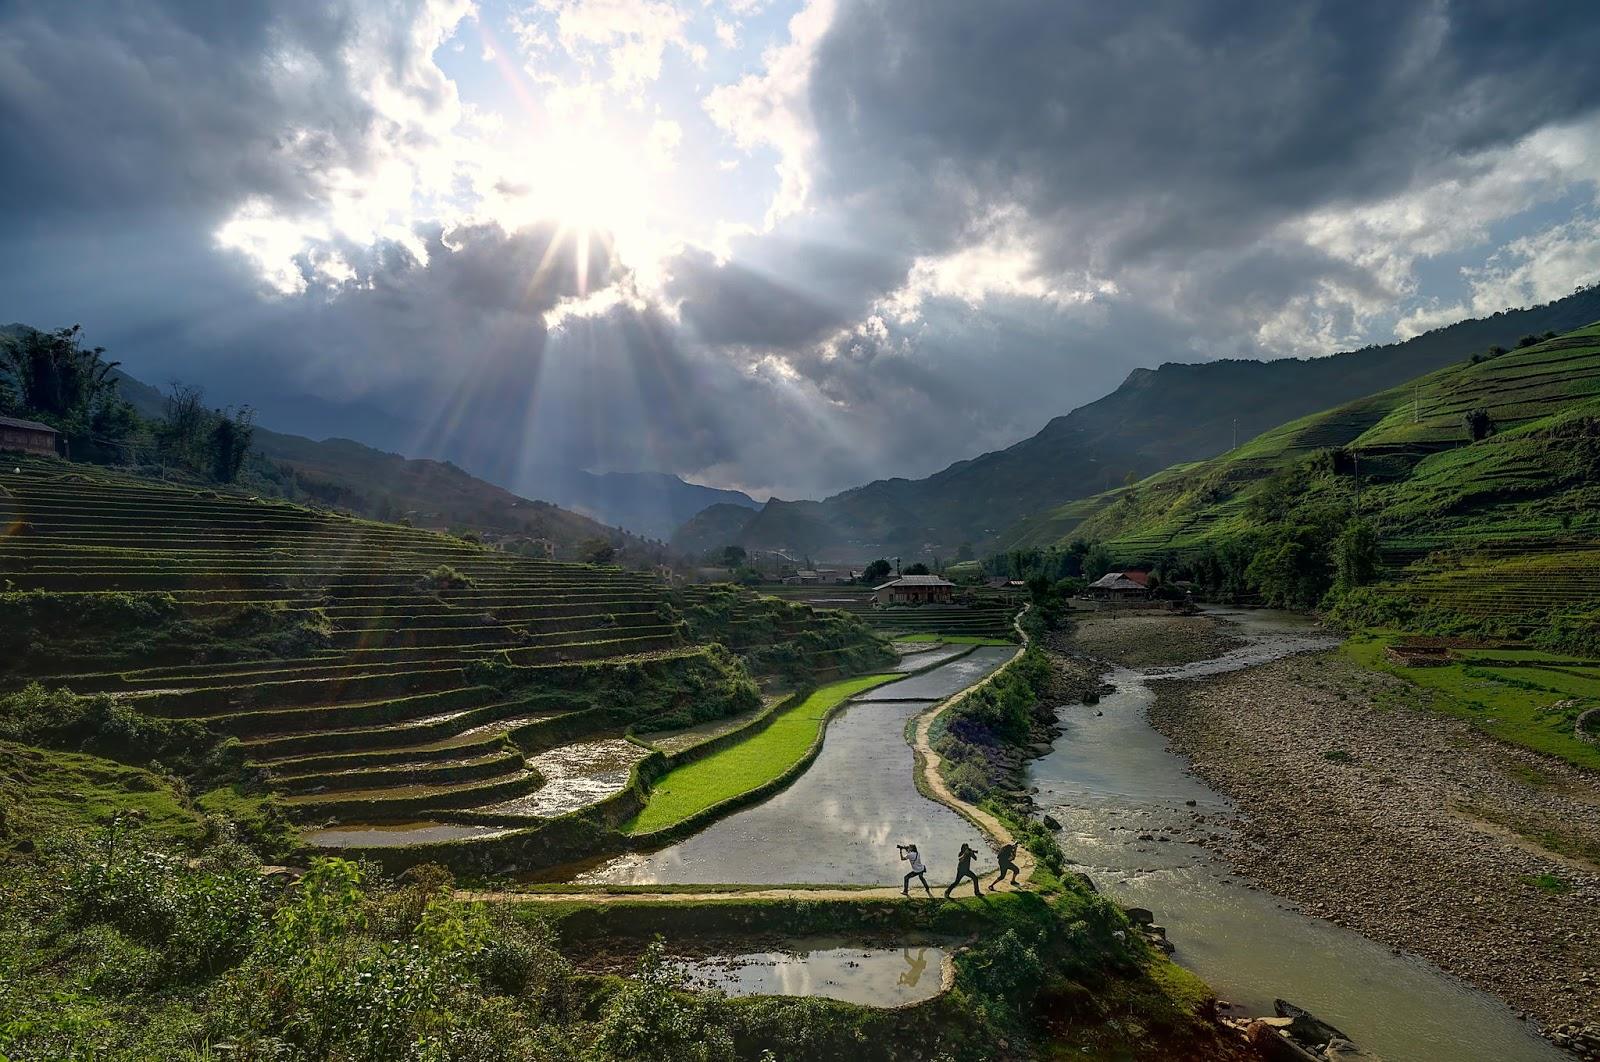 Terrazas de arroz en vietnam paisajes y jardines pinterest - Paisajes de jardines ...